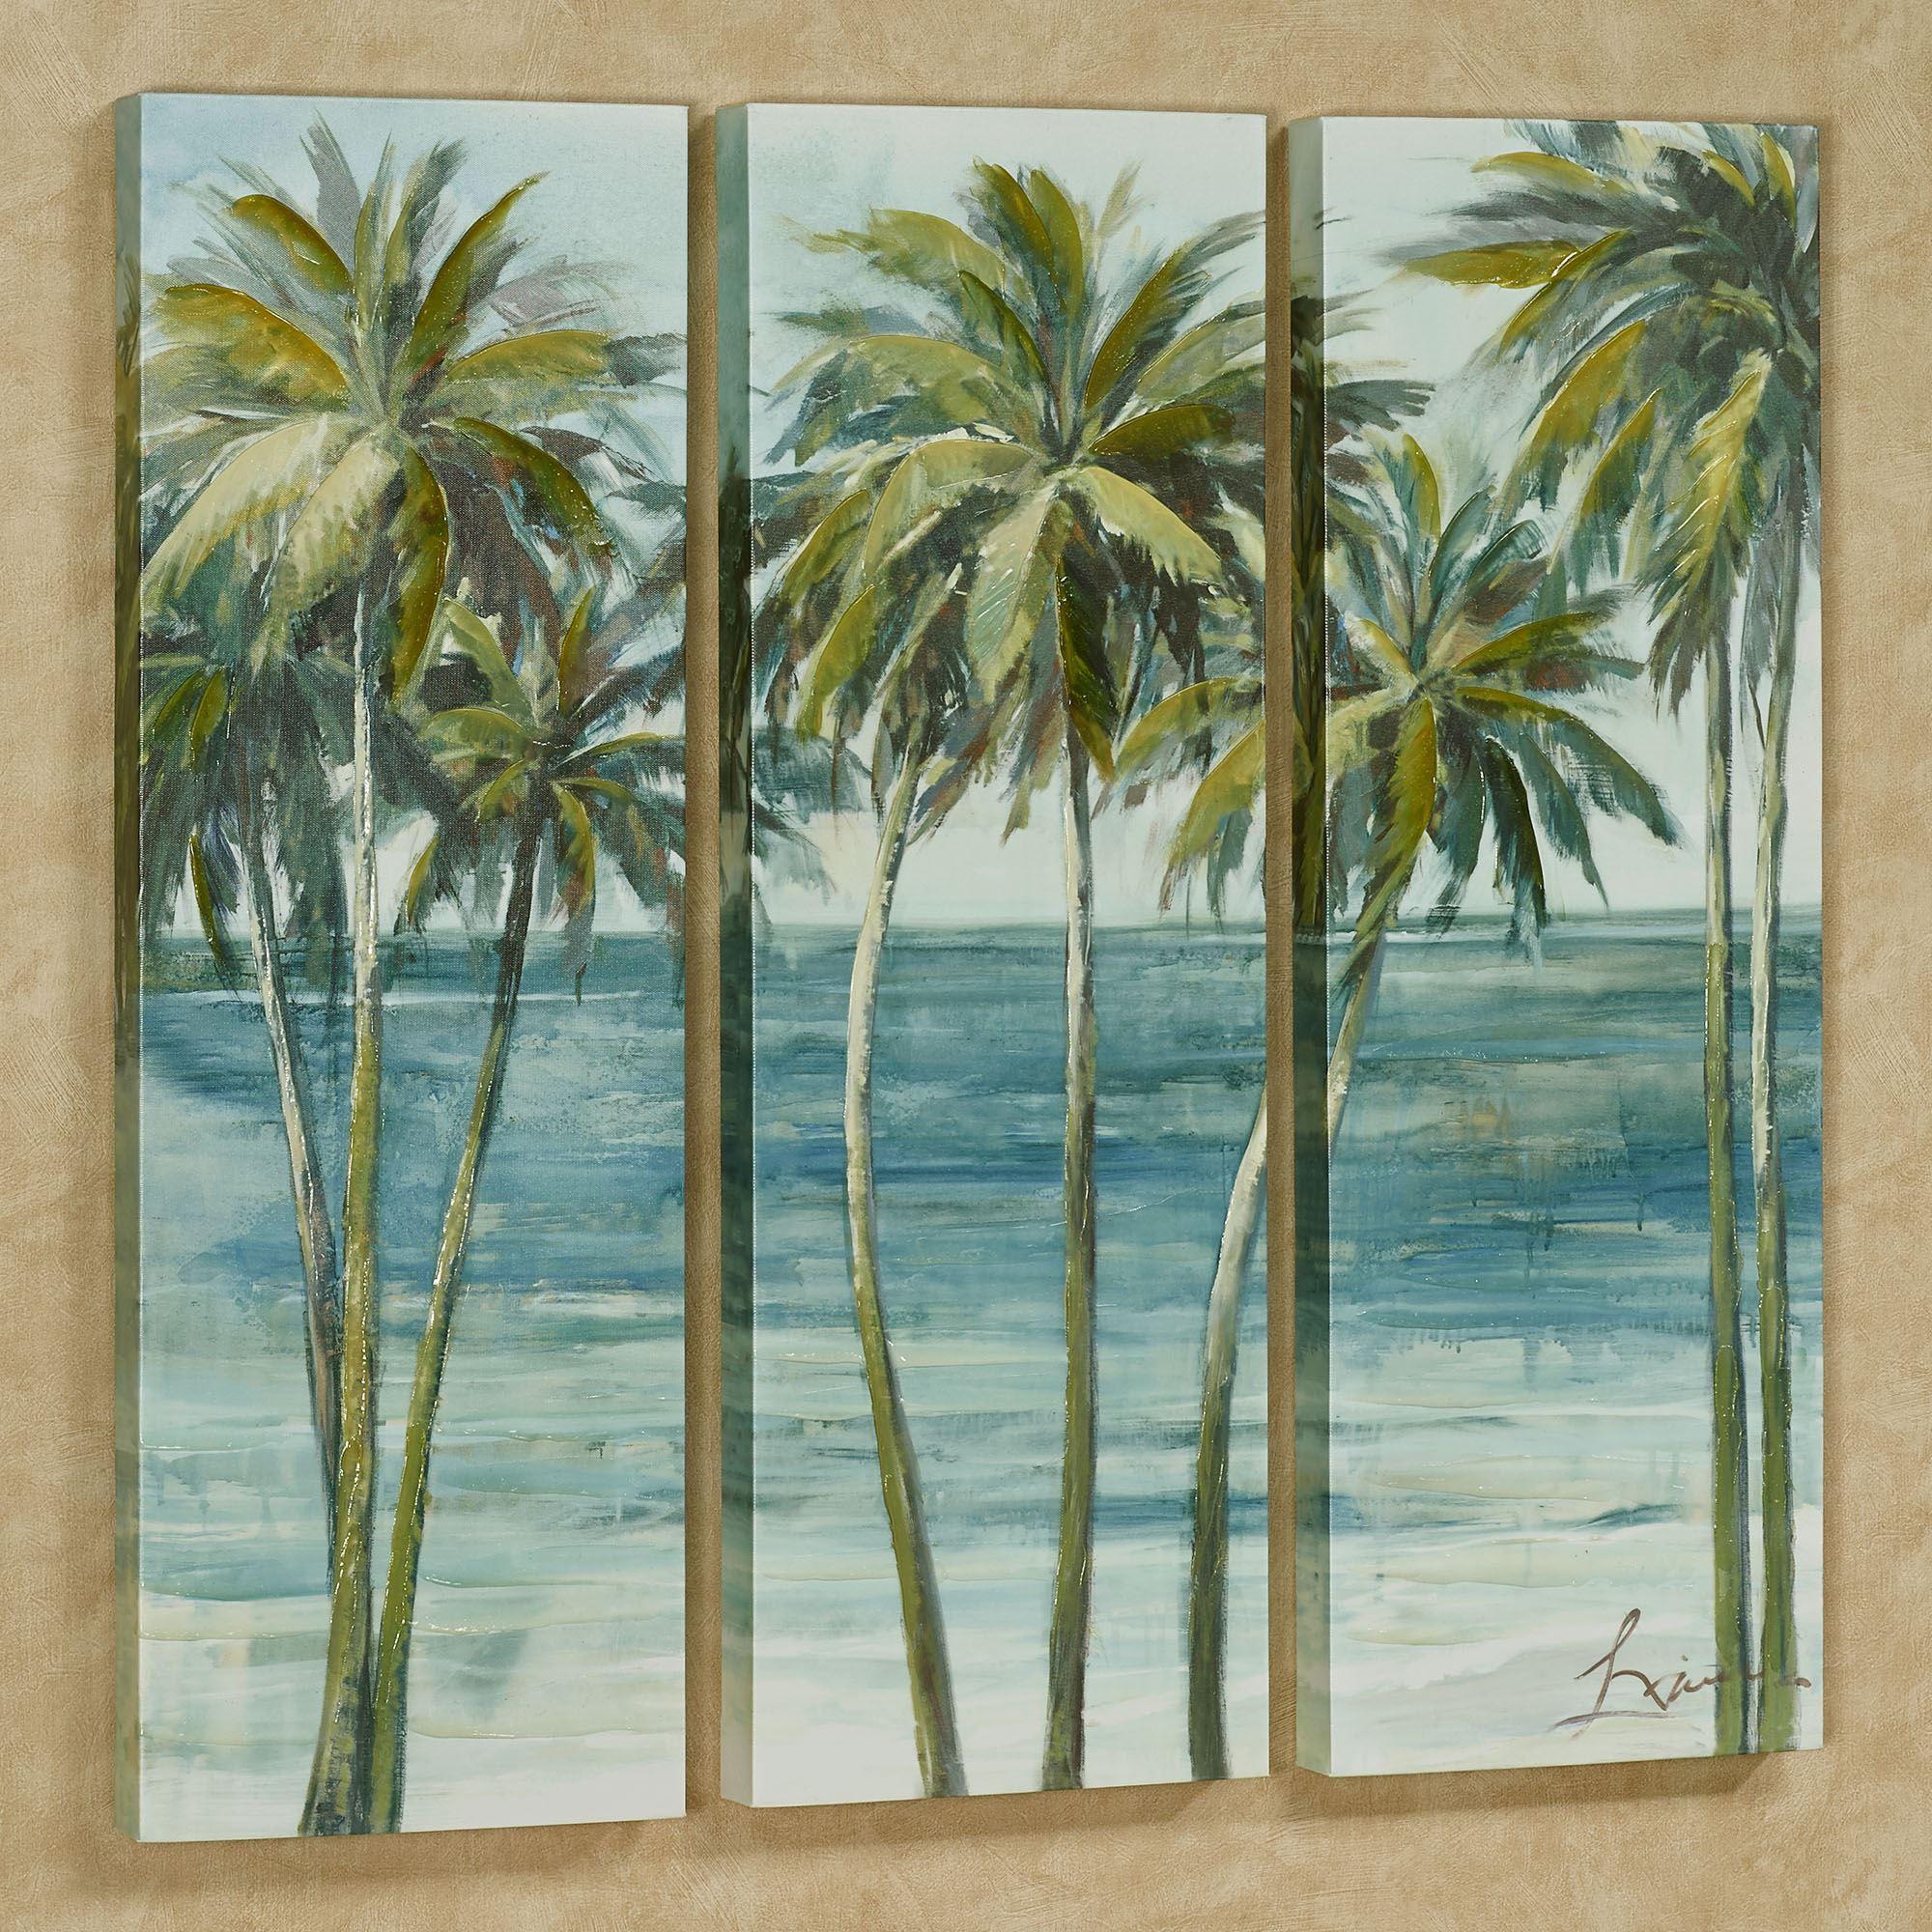 Tropical Bathroom Wall Decor: Tropical Getaway Palm Tree Triptych Canvas Wall Art Set